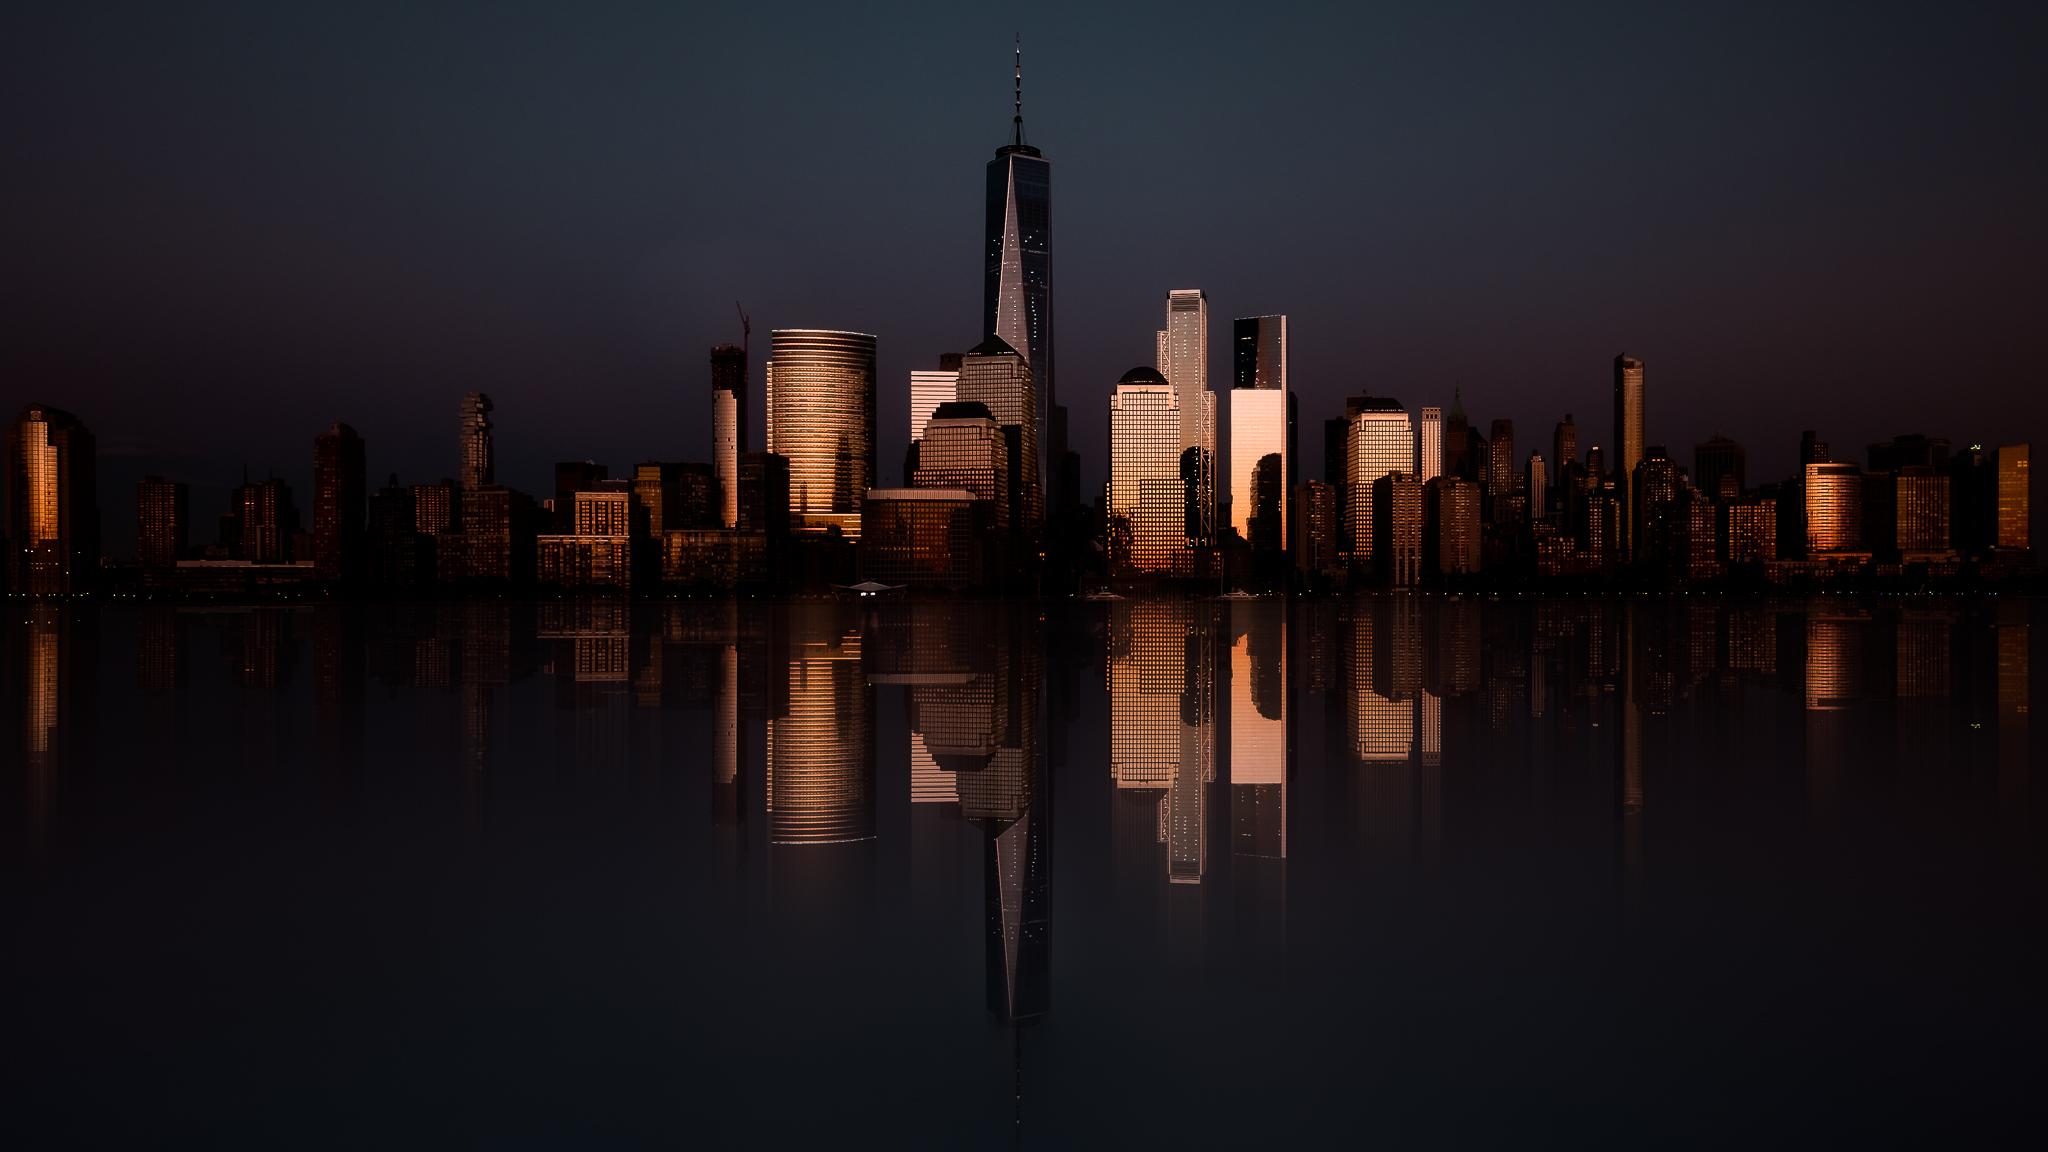 2017-09-08-newyorkx (30)-Modifier-2-Modifier-test.jpg